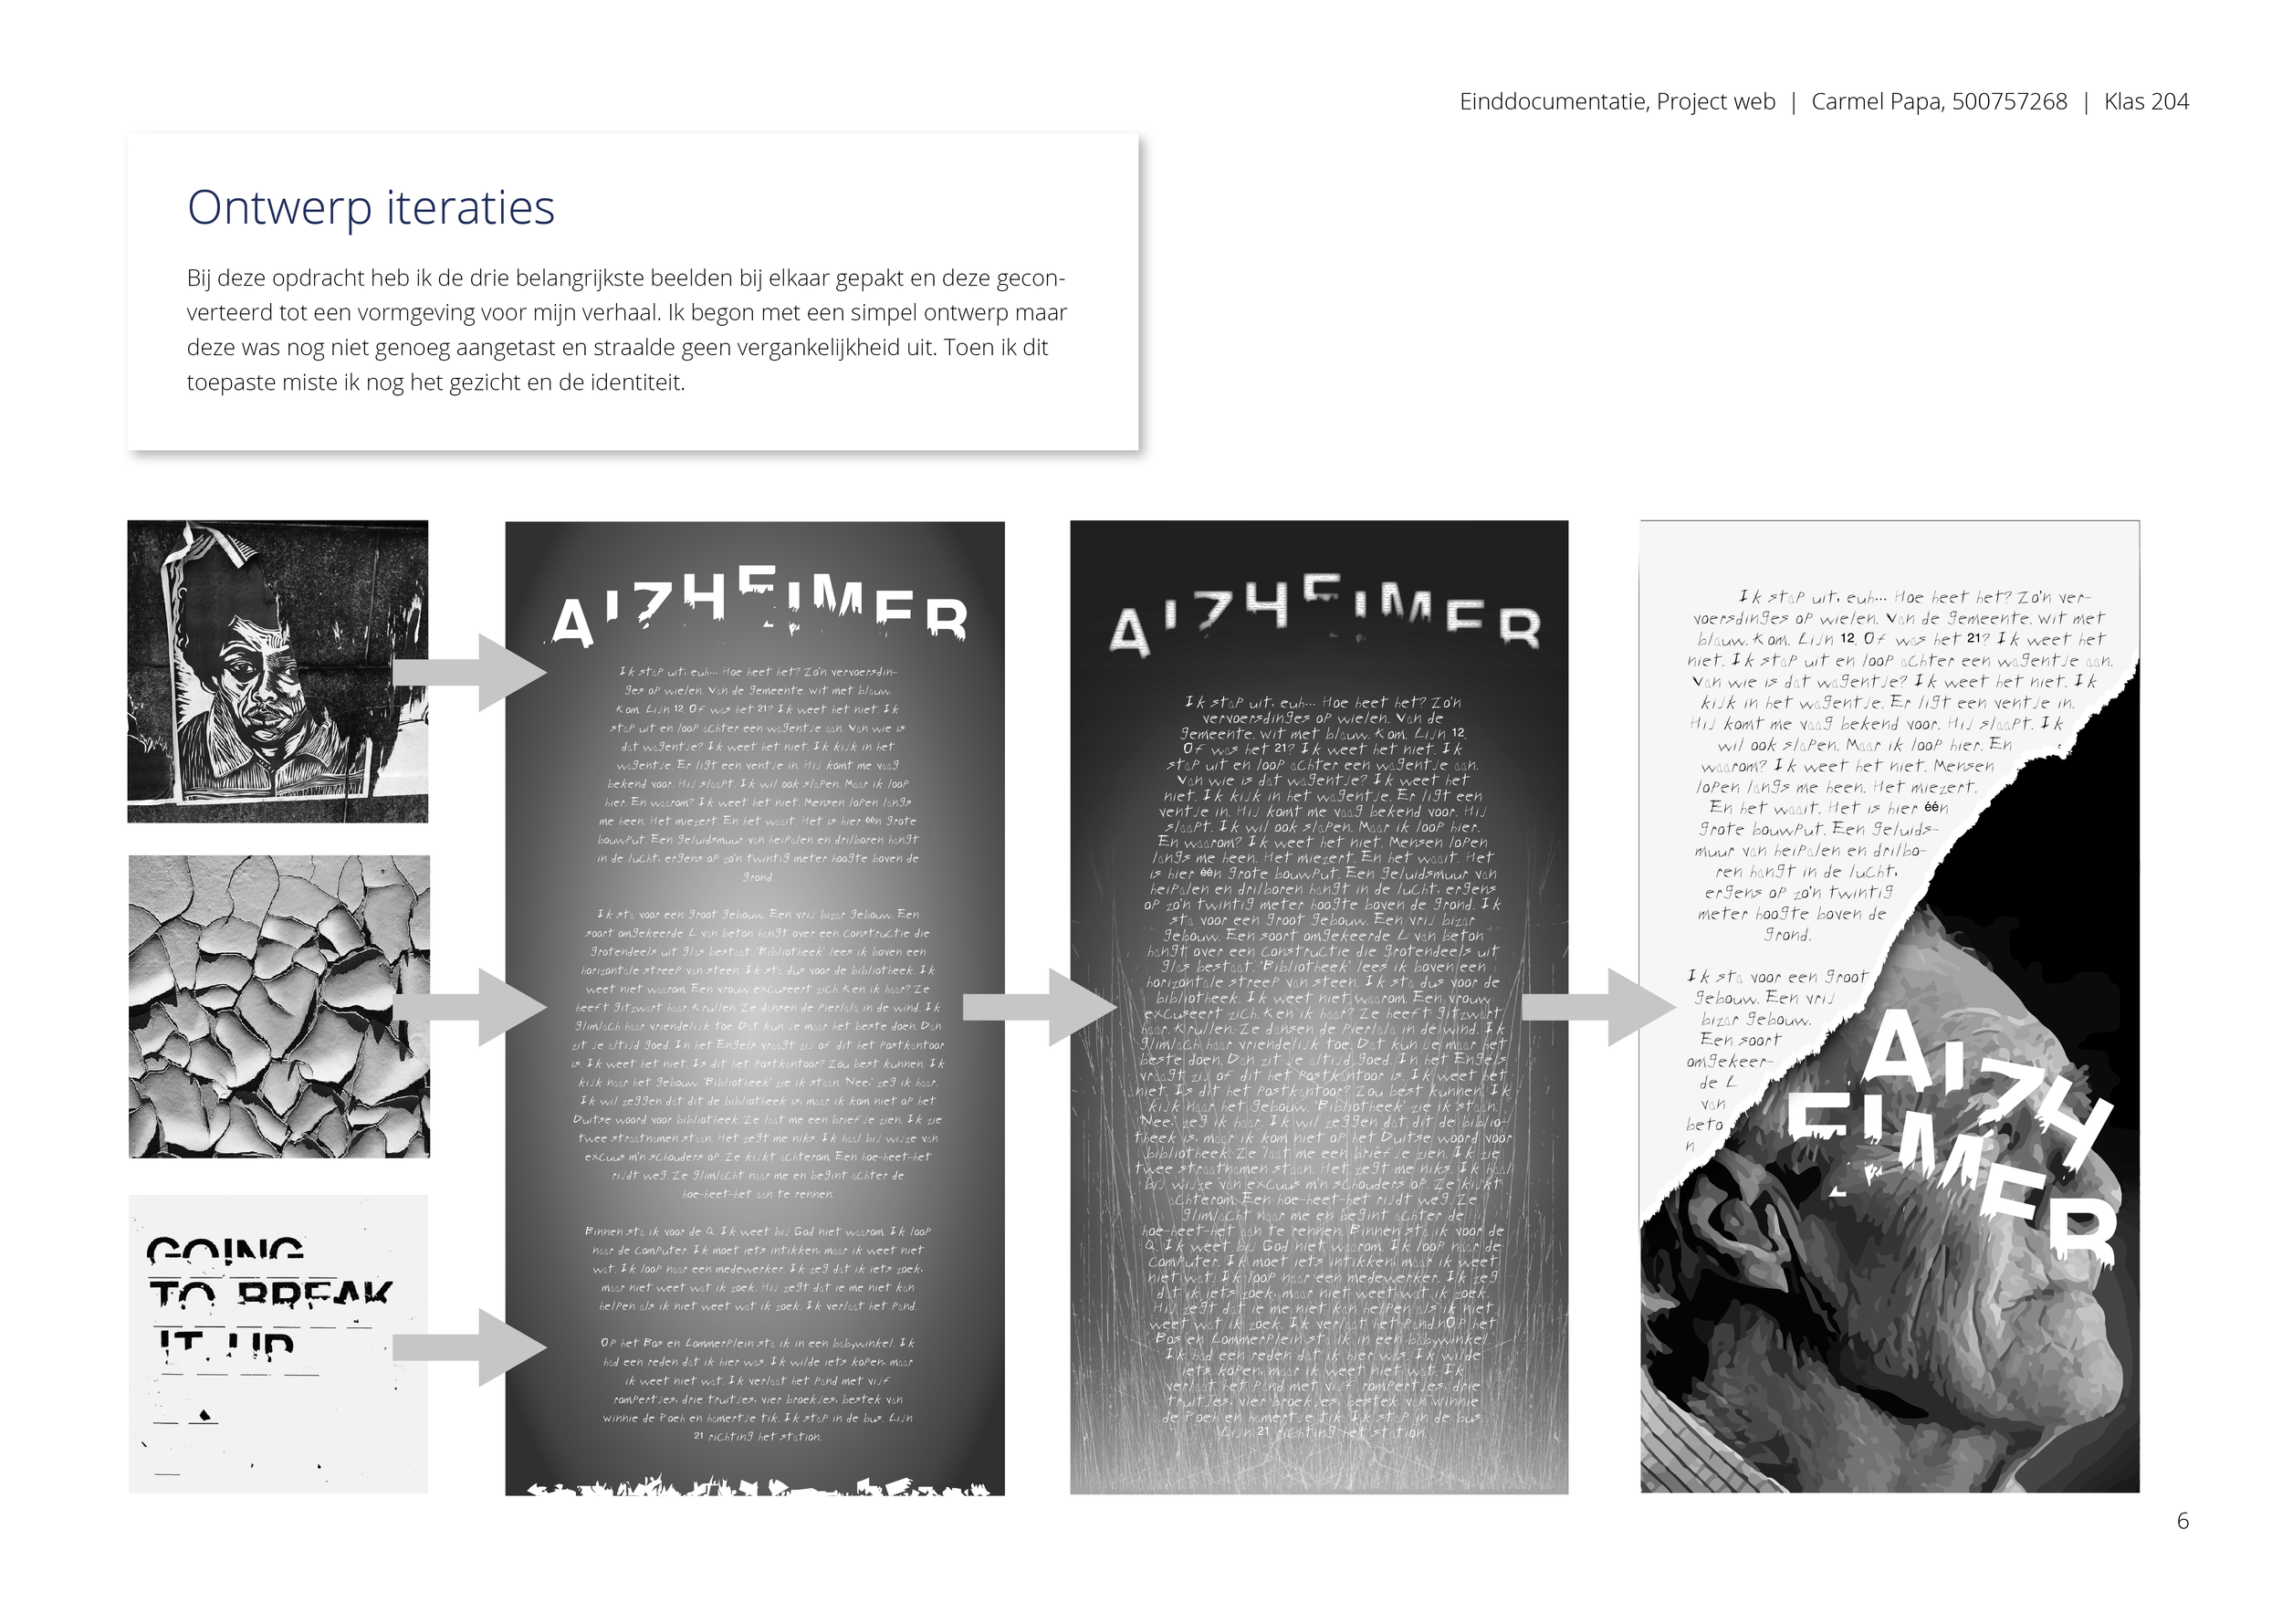 Einddocument_Project Web_Carmel Papa_204_Iteraties ontwerp.png